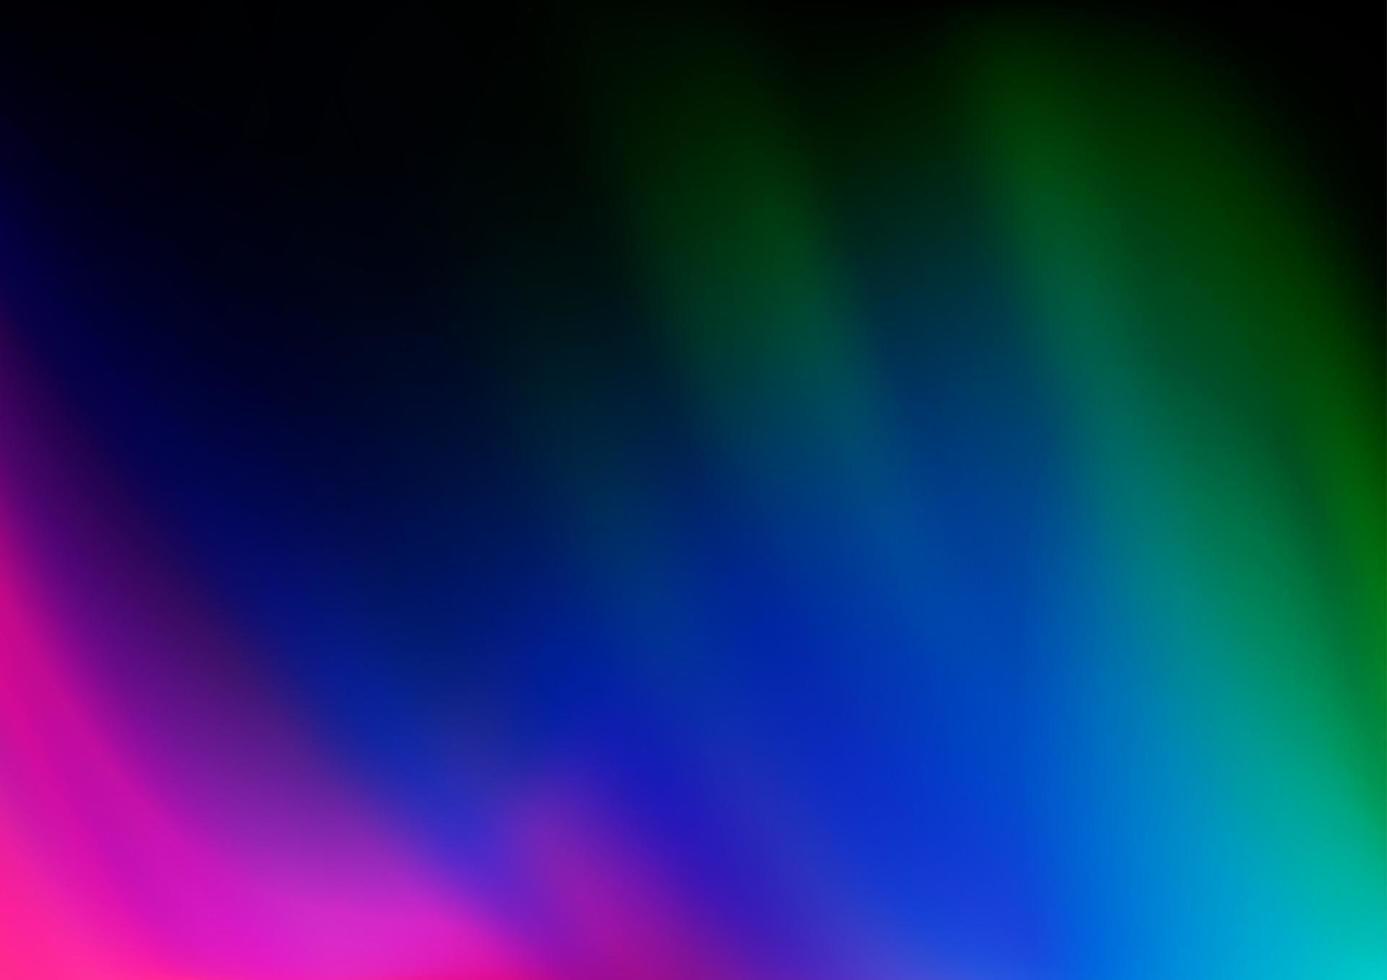 multicolor escuro, padrão de bokeh abstrato de vetor de arco-íris.